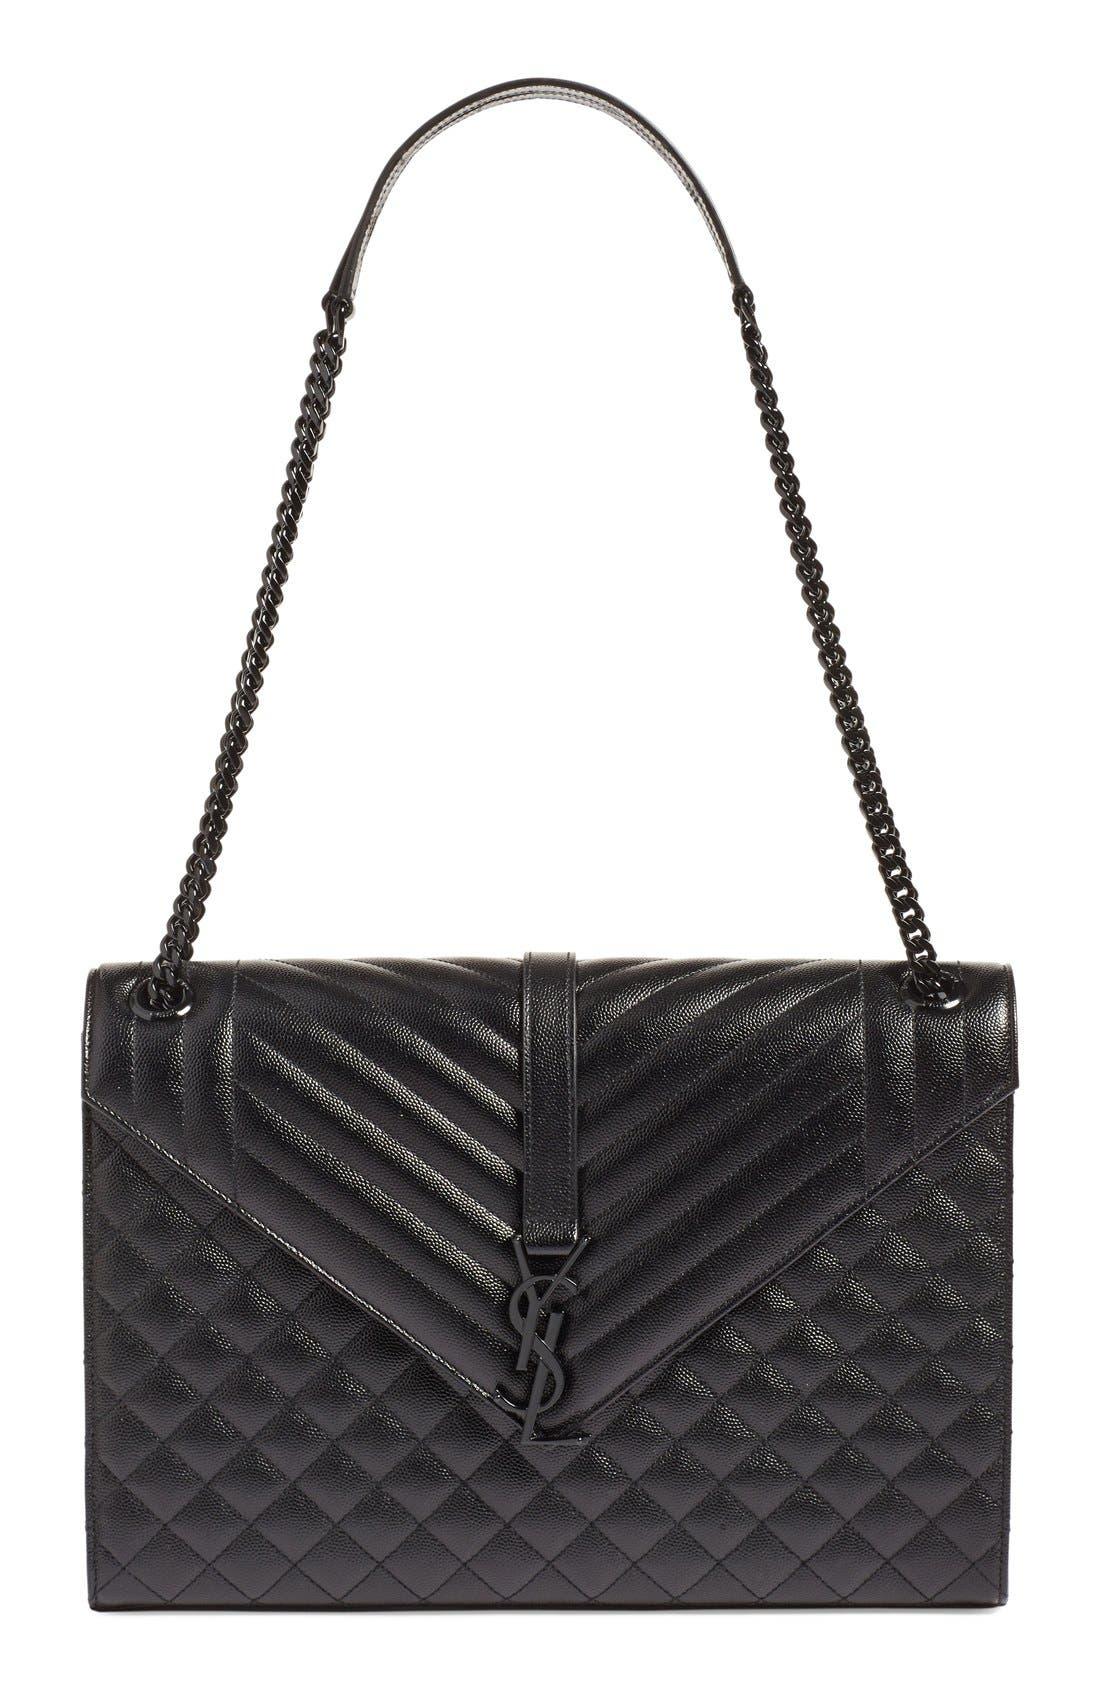 SAINT LAURENT 'Medium Monogram' Chevron Quilted Leather Shoulder Bag, Main, color, 001